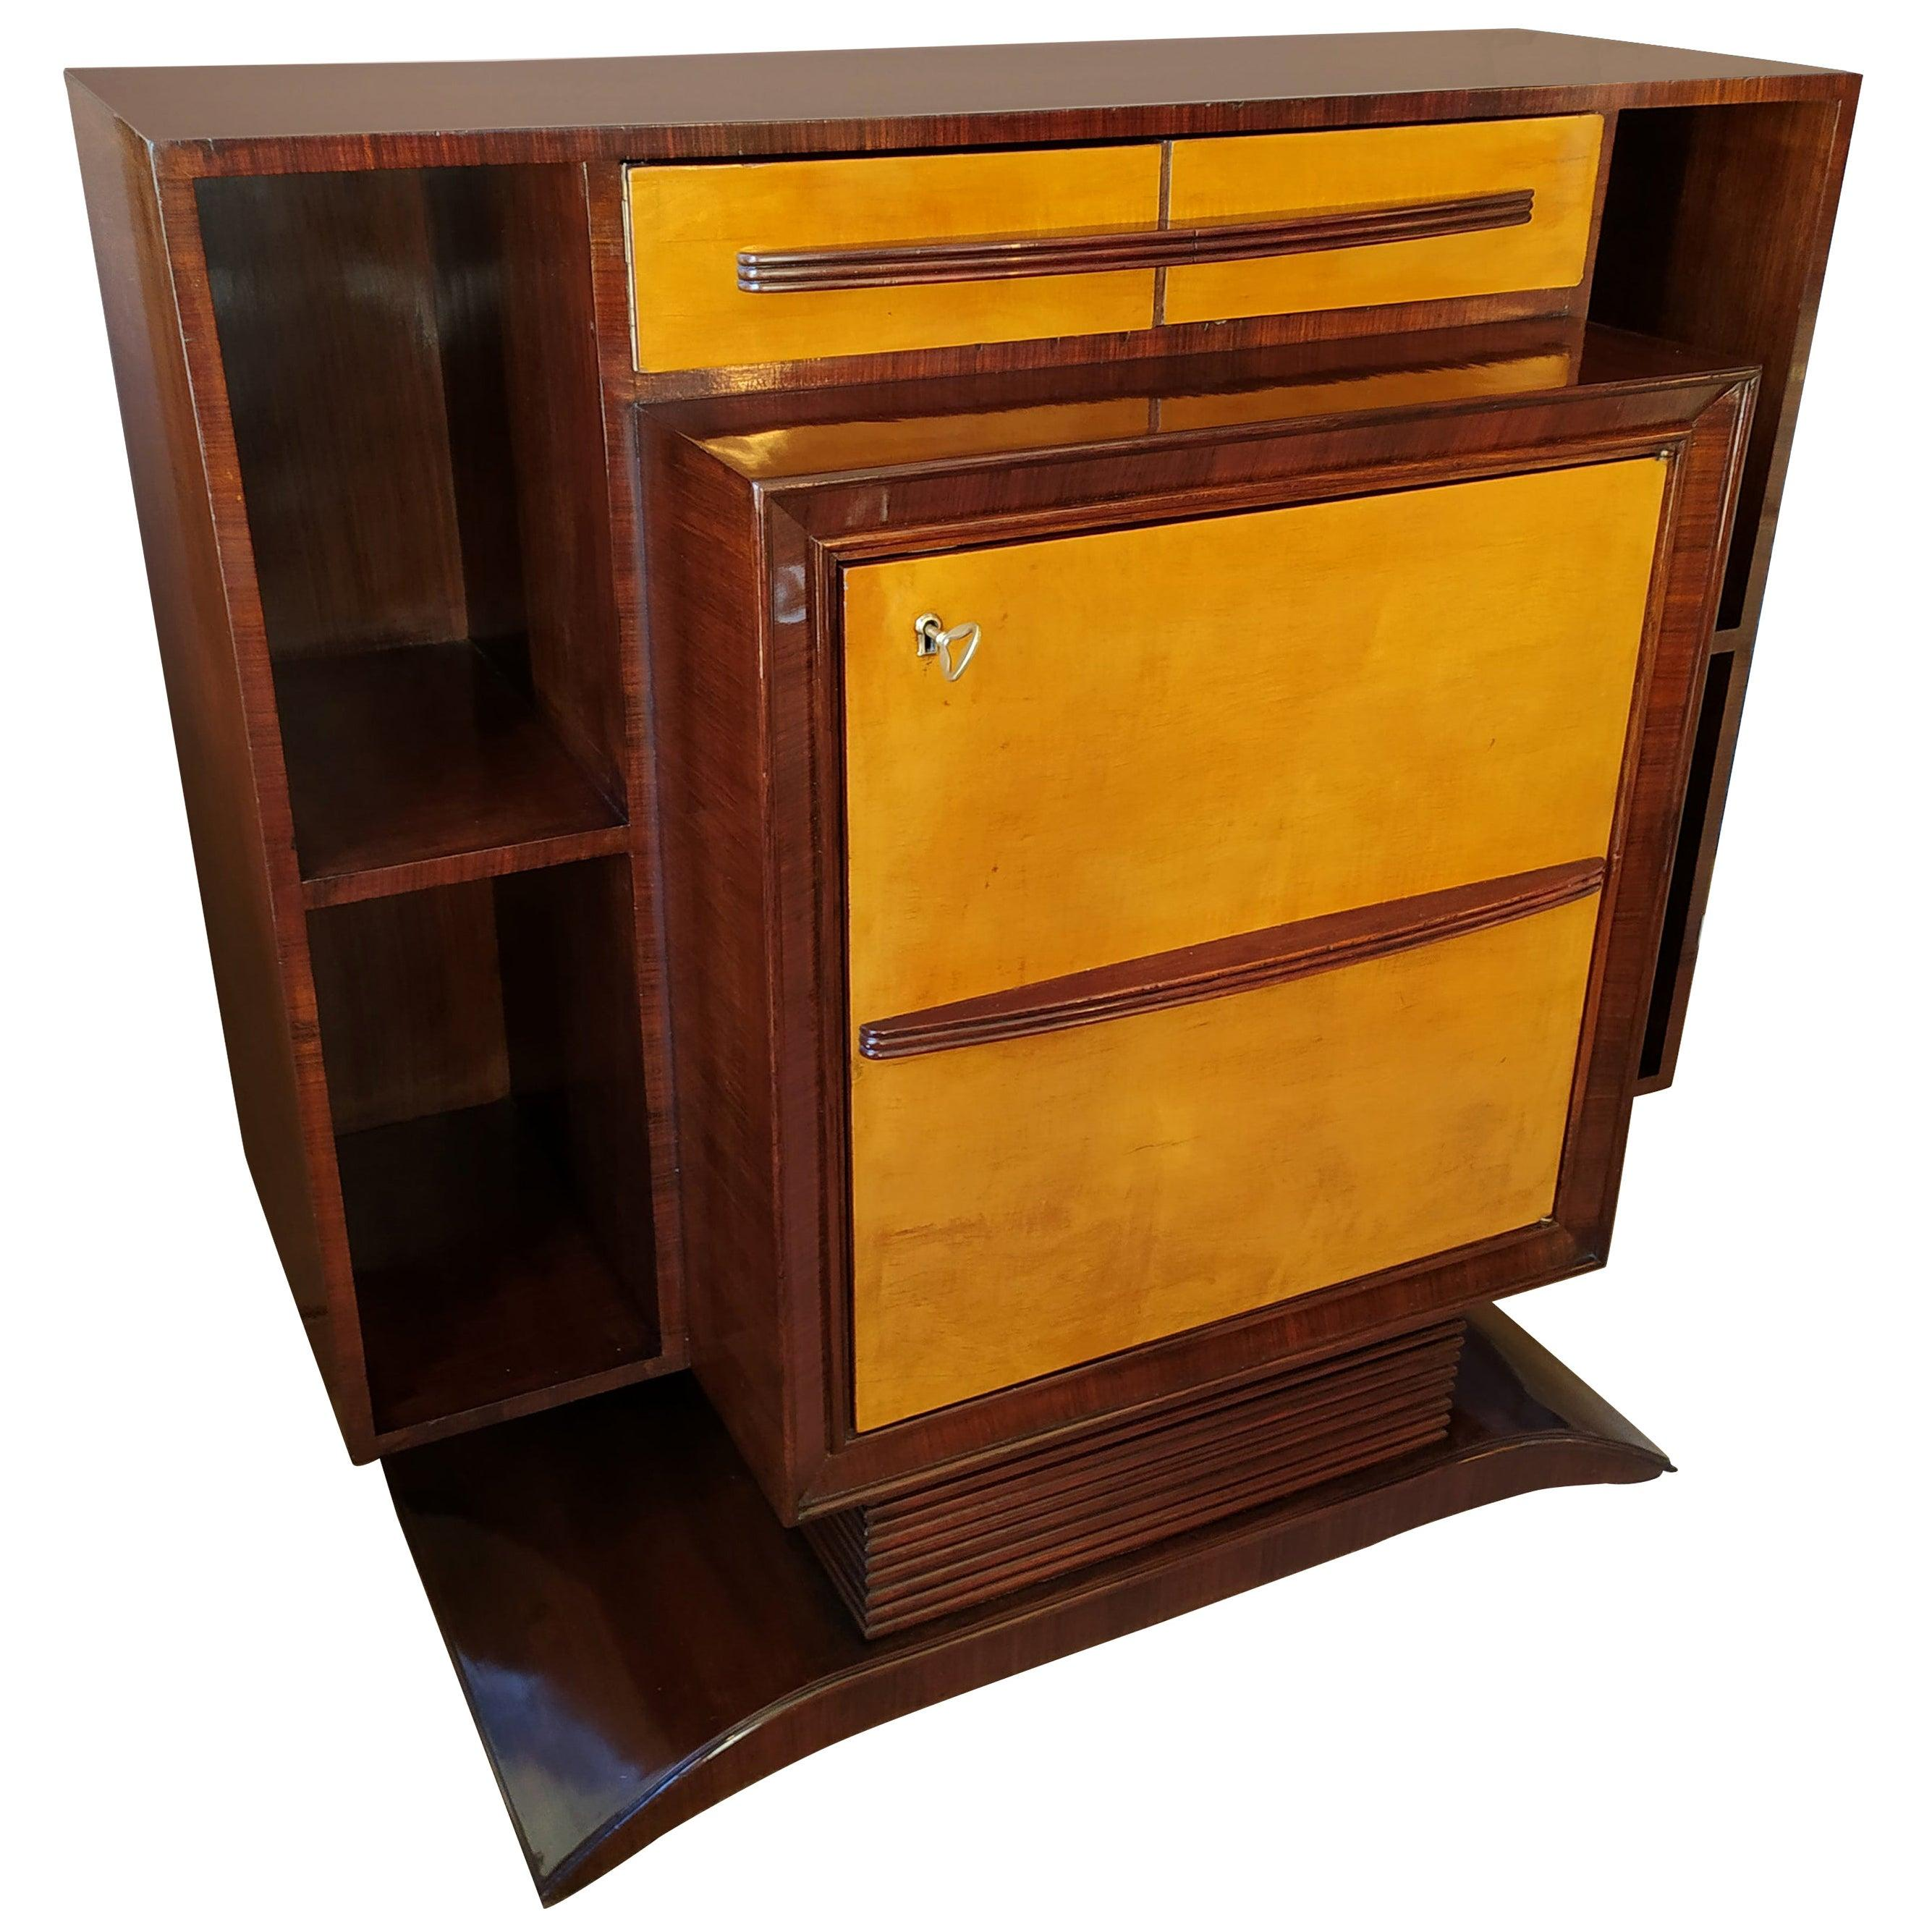 1930s Astonishing Italian Art Deco Cabinet Designed by Silvio Cavatorta